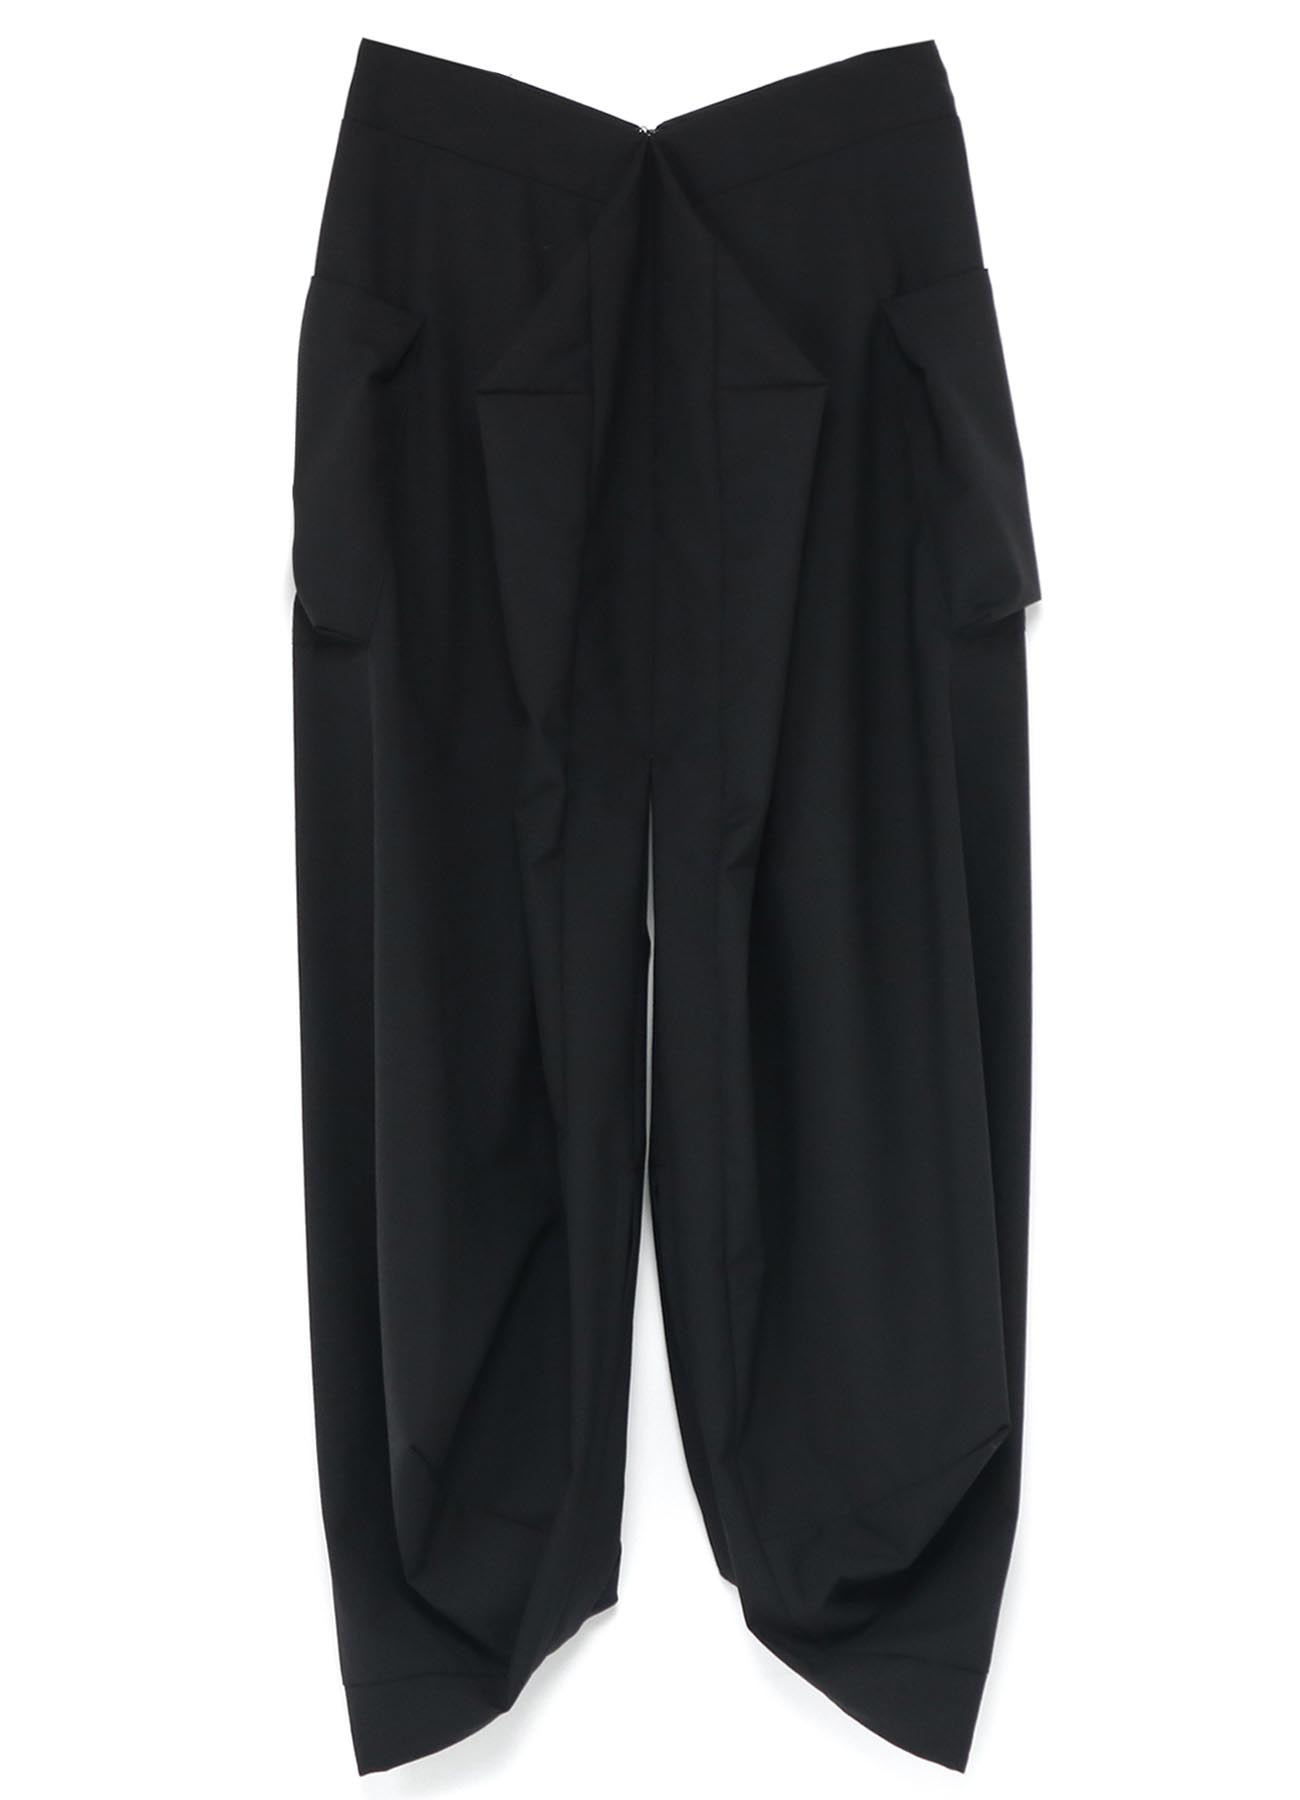 W/Moh Tropical Square Pants